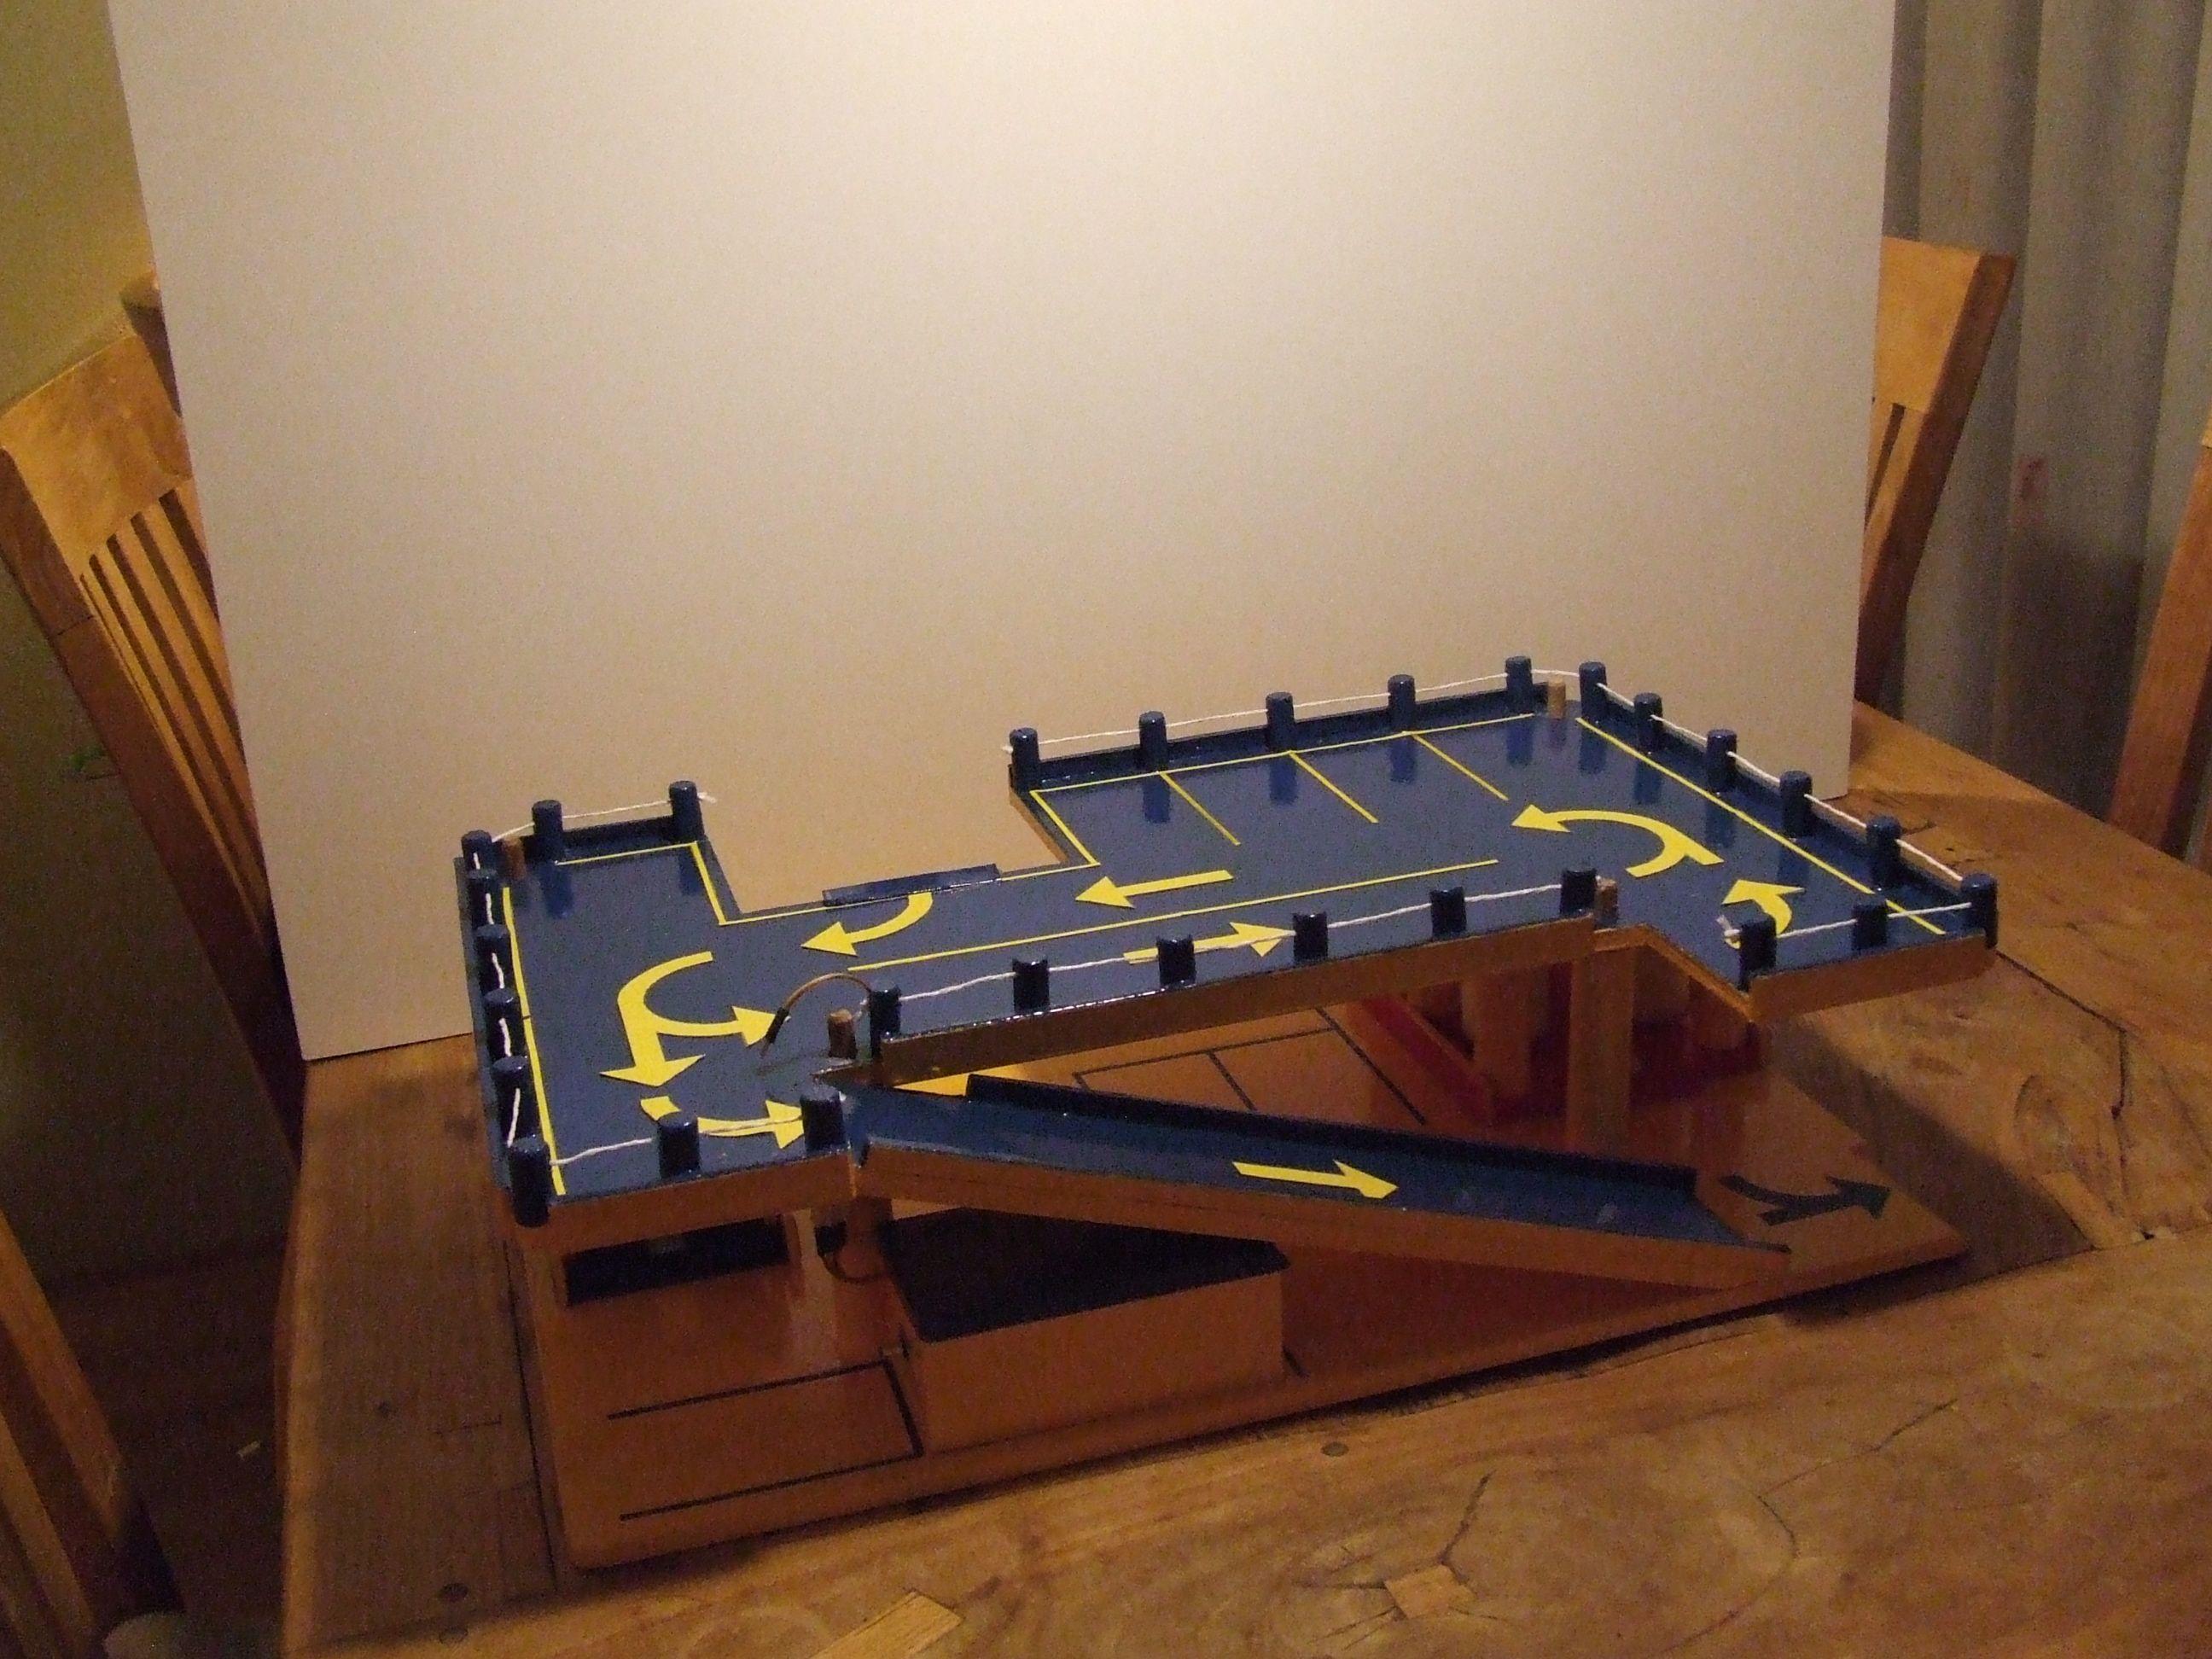 build up 9th stage | Wooden Toy Garage | Pinterest